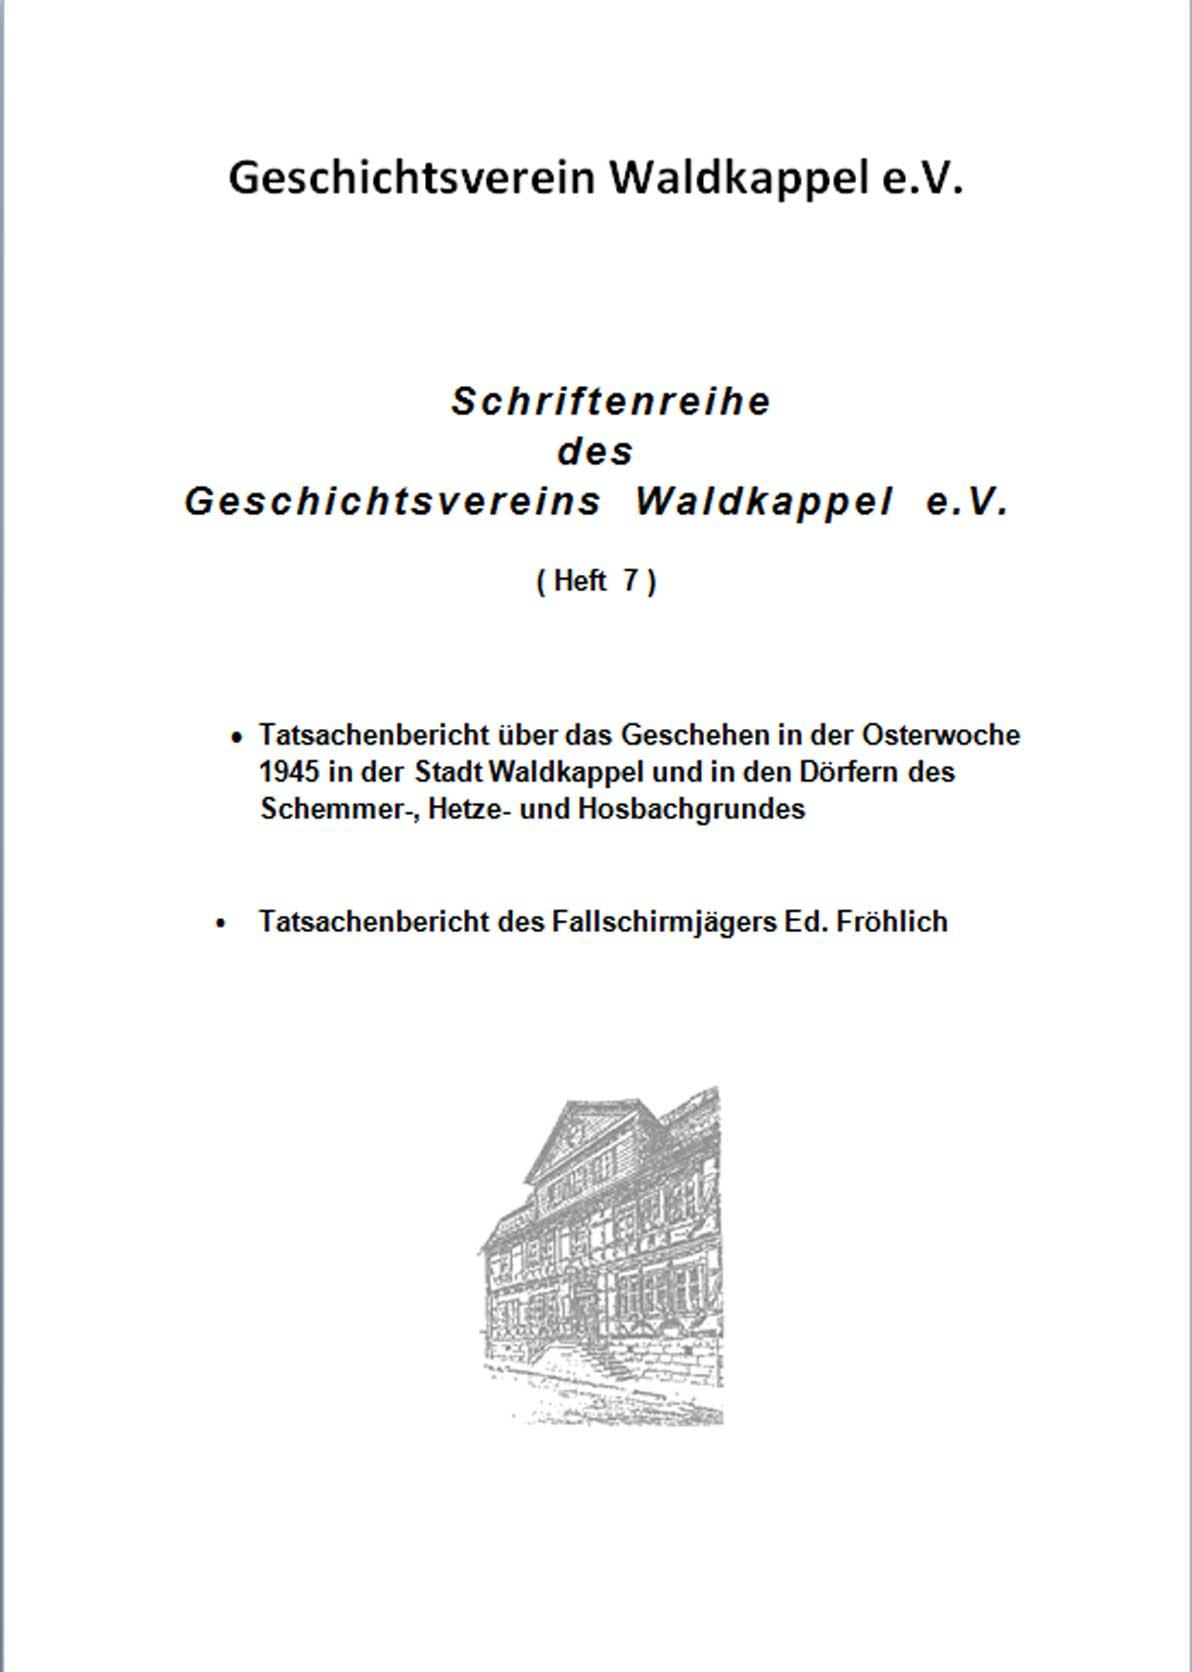 NEU >> Schriftenreihe ‐ Heft 7 ‐